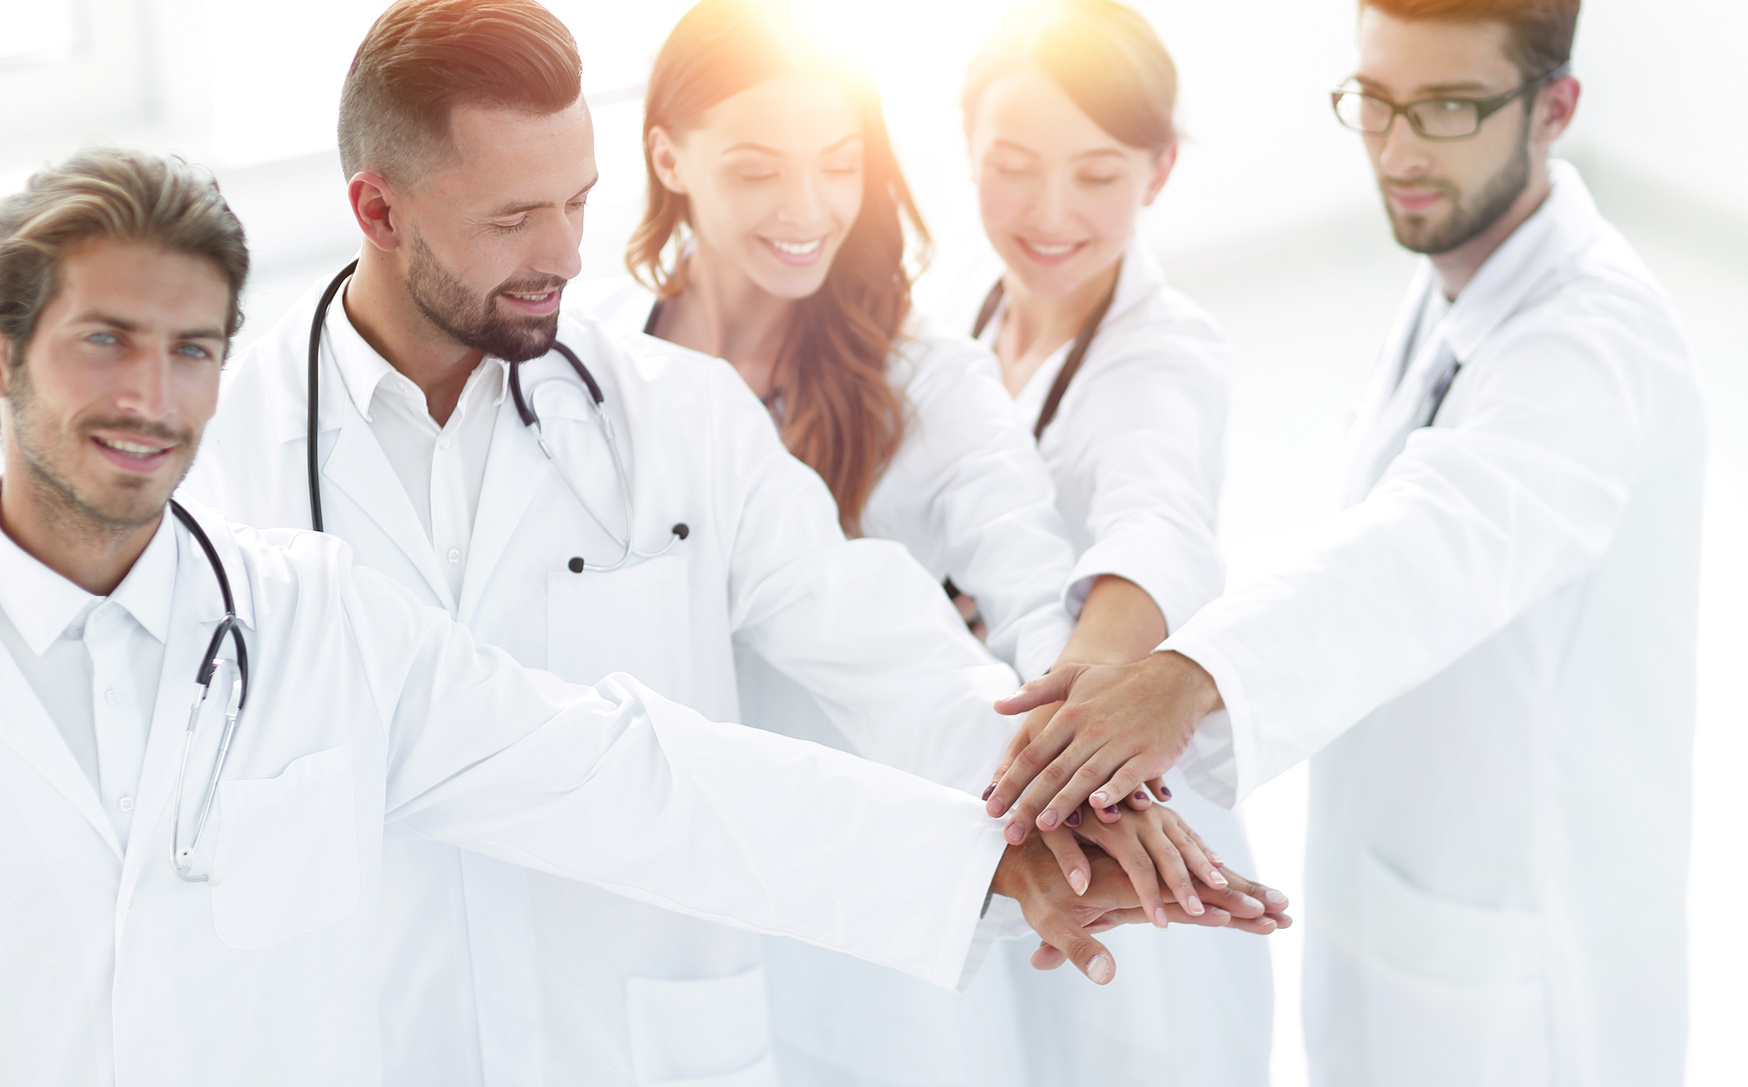 Joyful doctors are proud of their teamwork